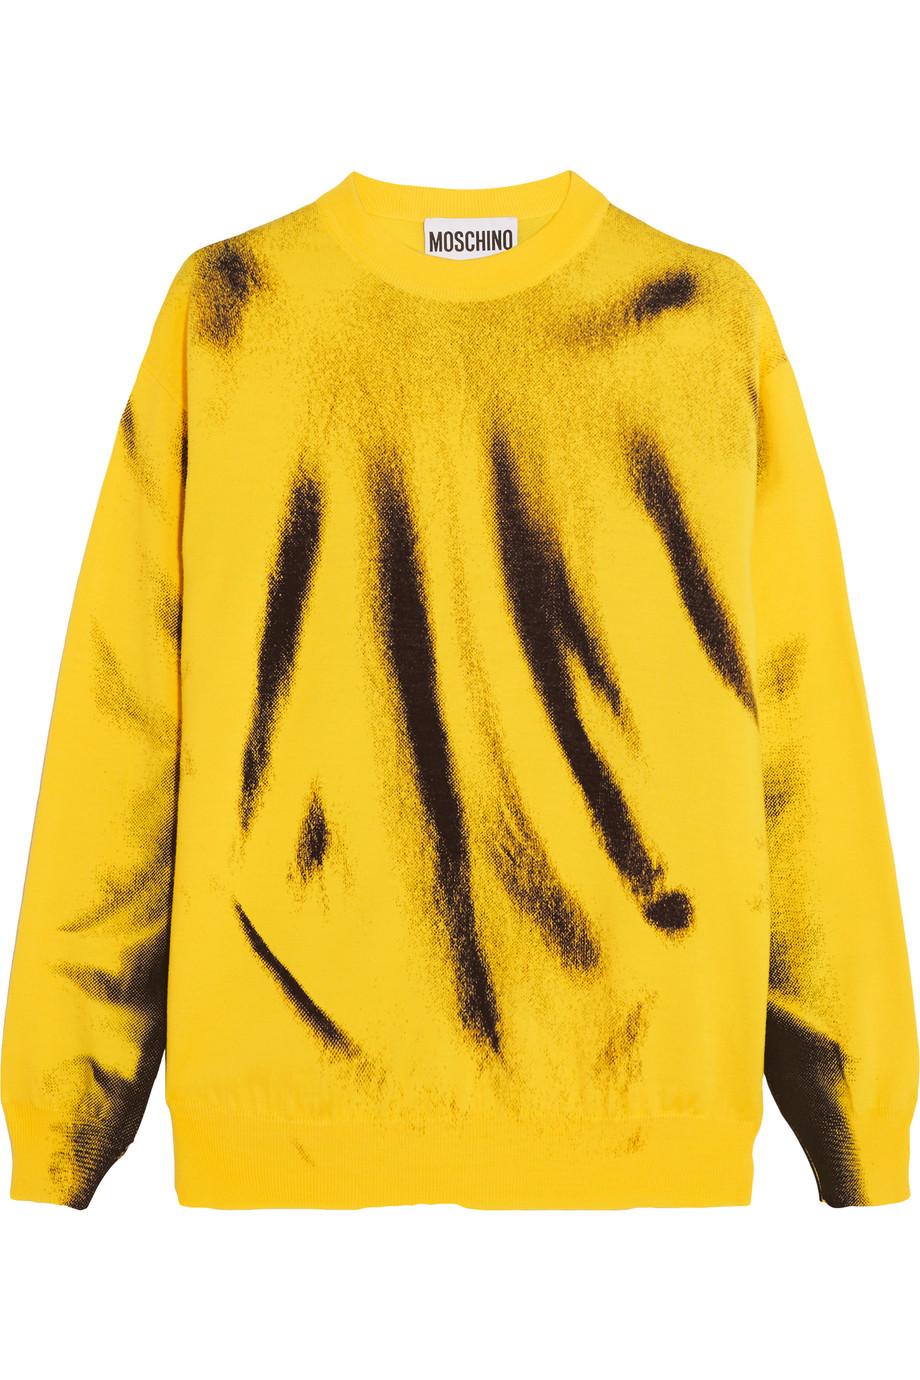 Moschino Printed Wool Sweater, Yellow, Women's, Size: XS